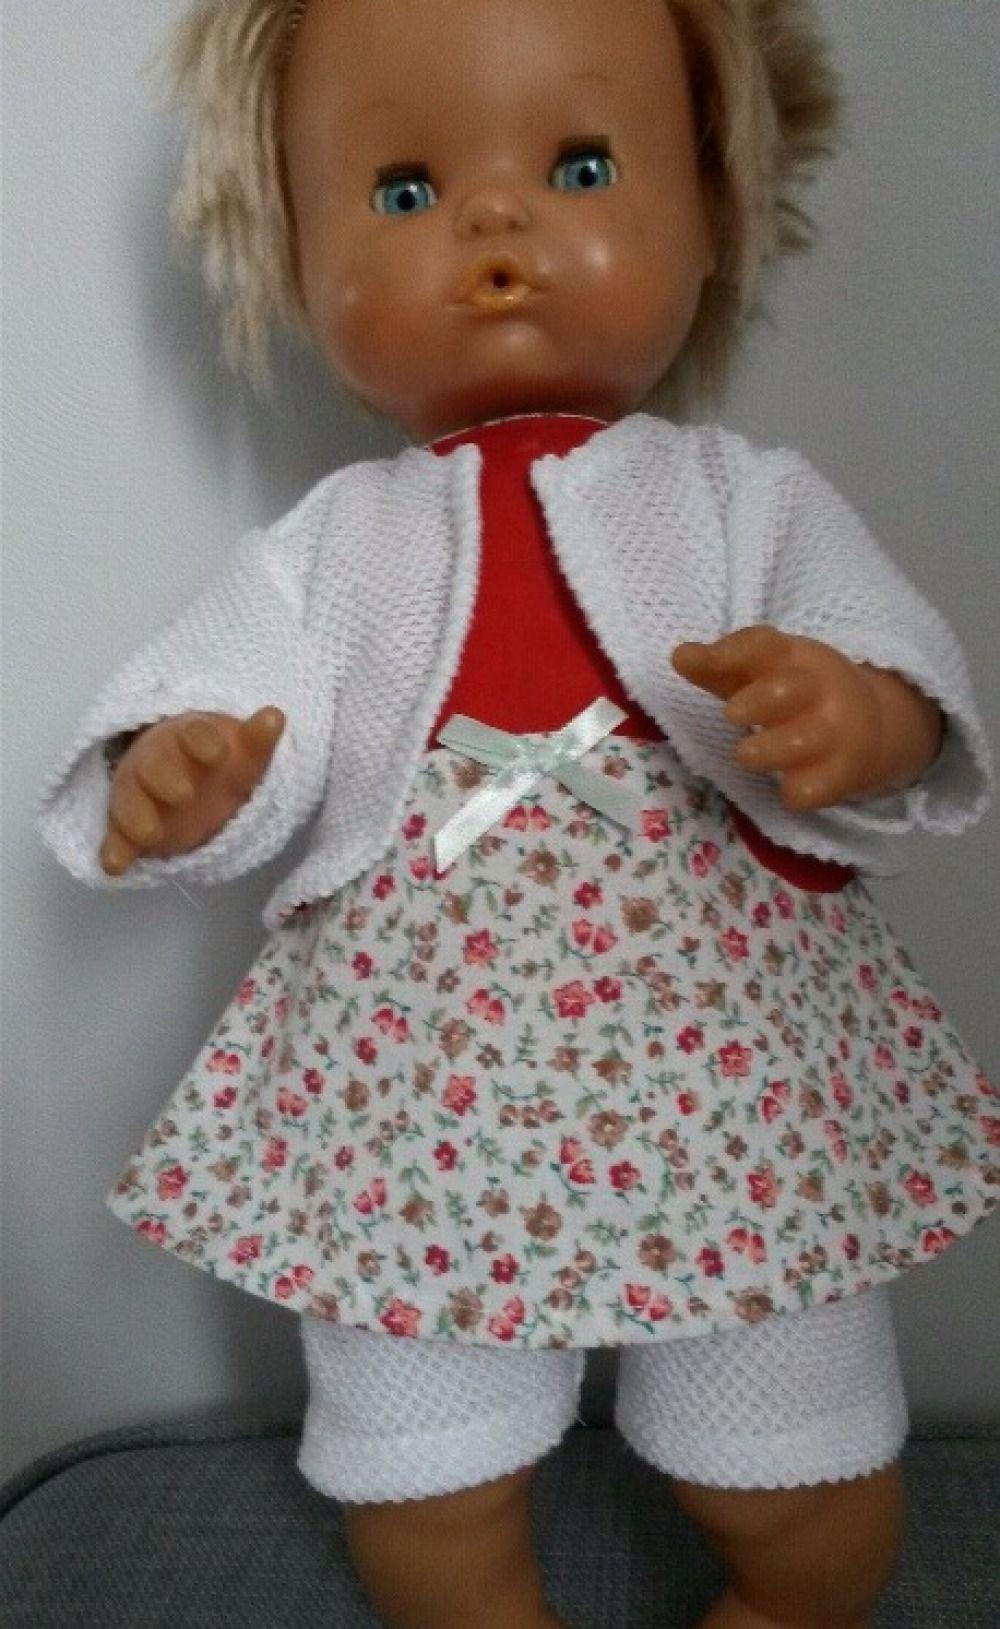 cb796f703cfbd Vêtement de poupon 36 a 40 cm ensemble gilet robe pantacourt ...